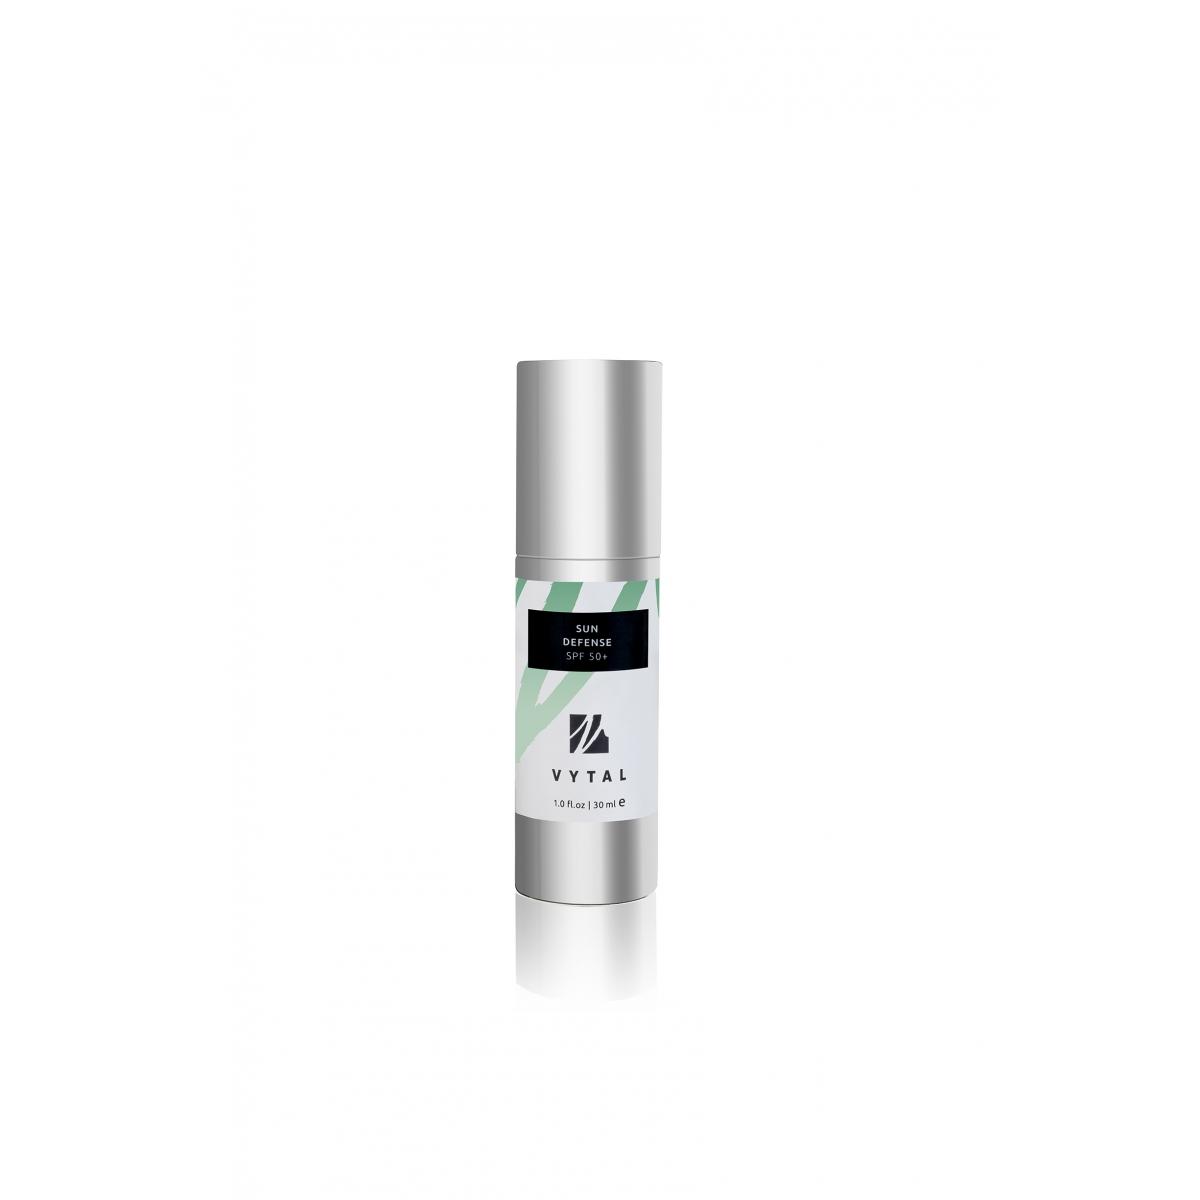 SOIN DU VISAGE - CREME PROTECTION SOLAIRE VYTAL SKIN UV50+ (30 ml)